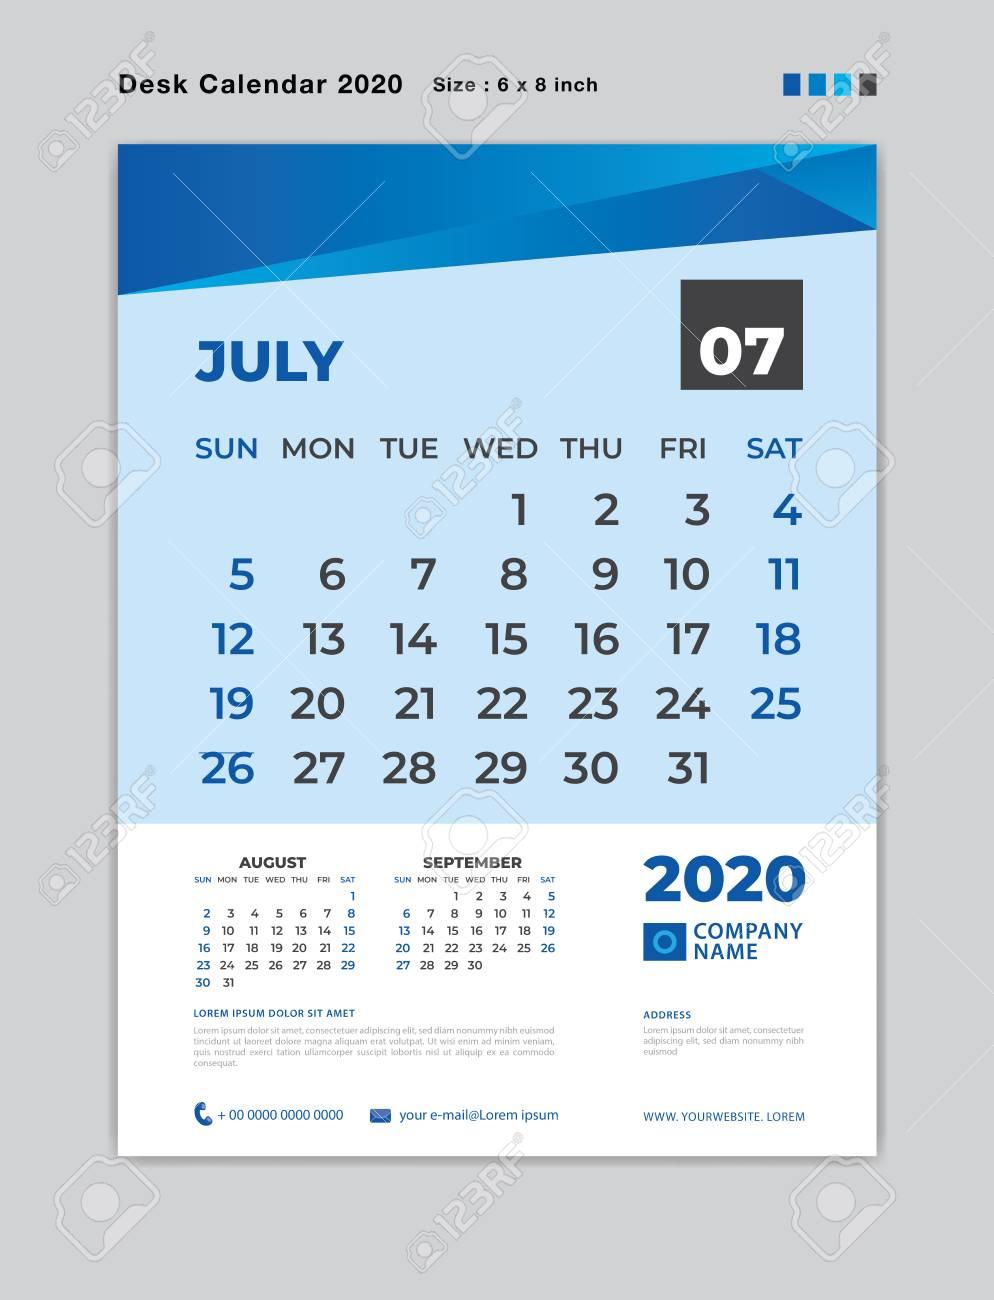 July 2020 Month Template, Desk Calendar For 2020 Year, Week Start..